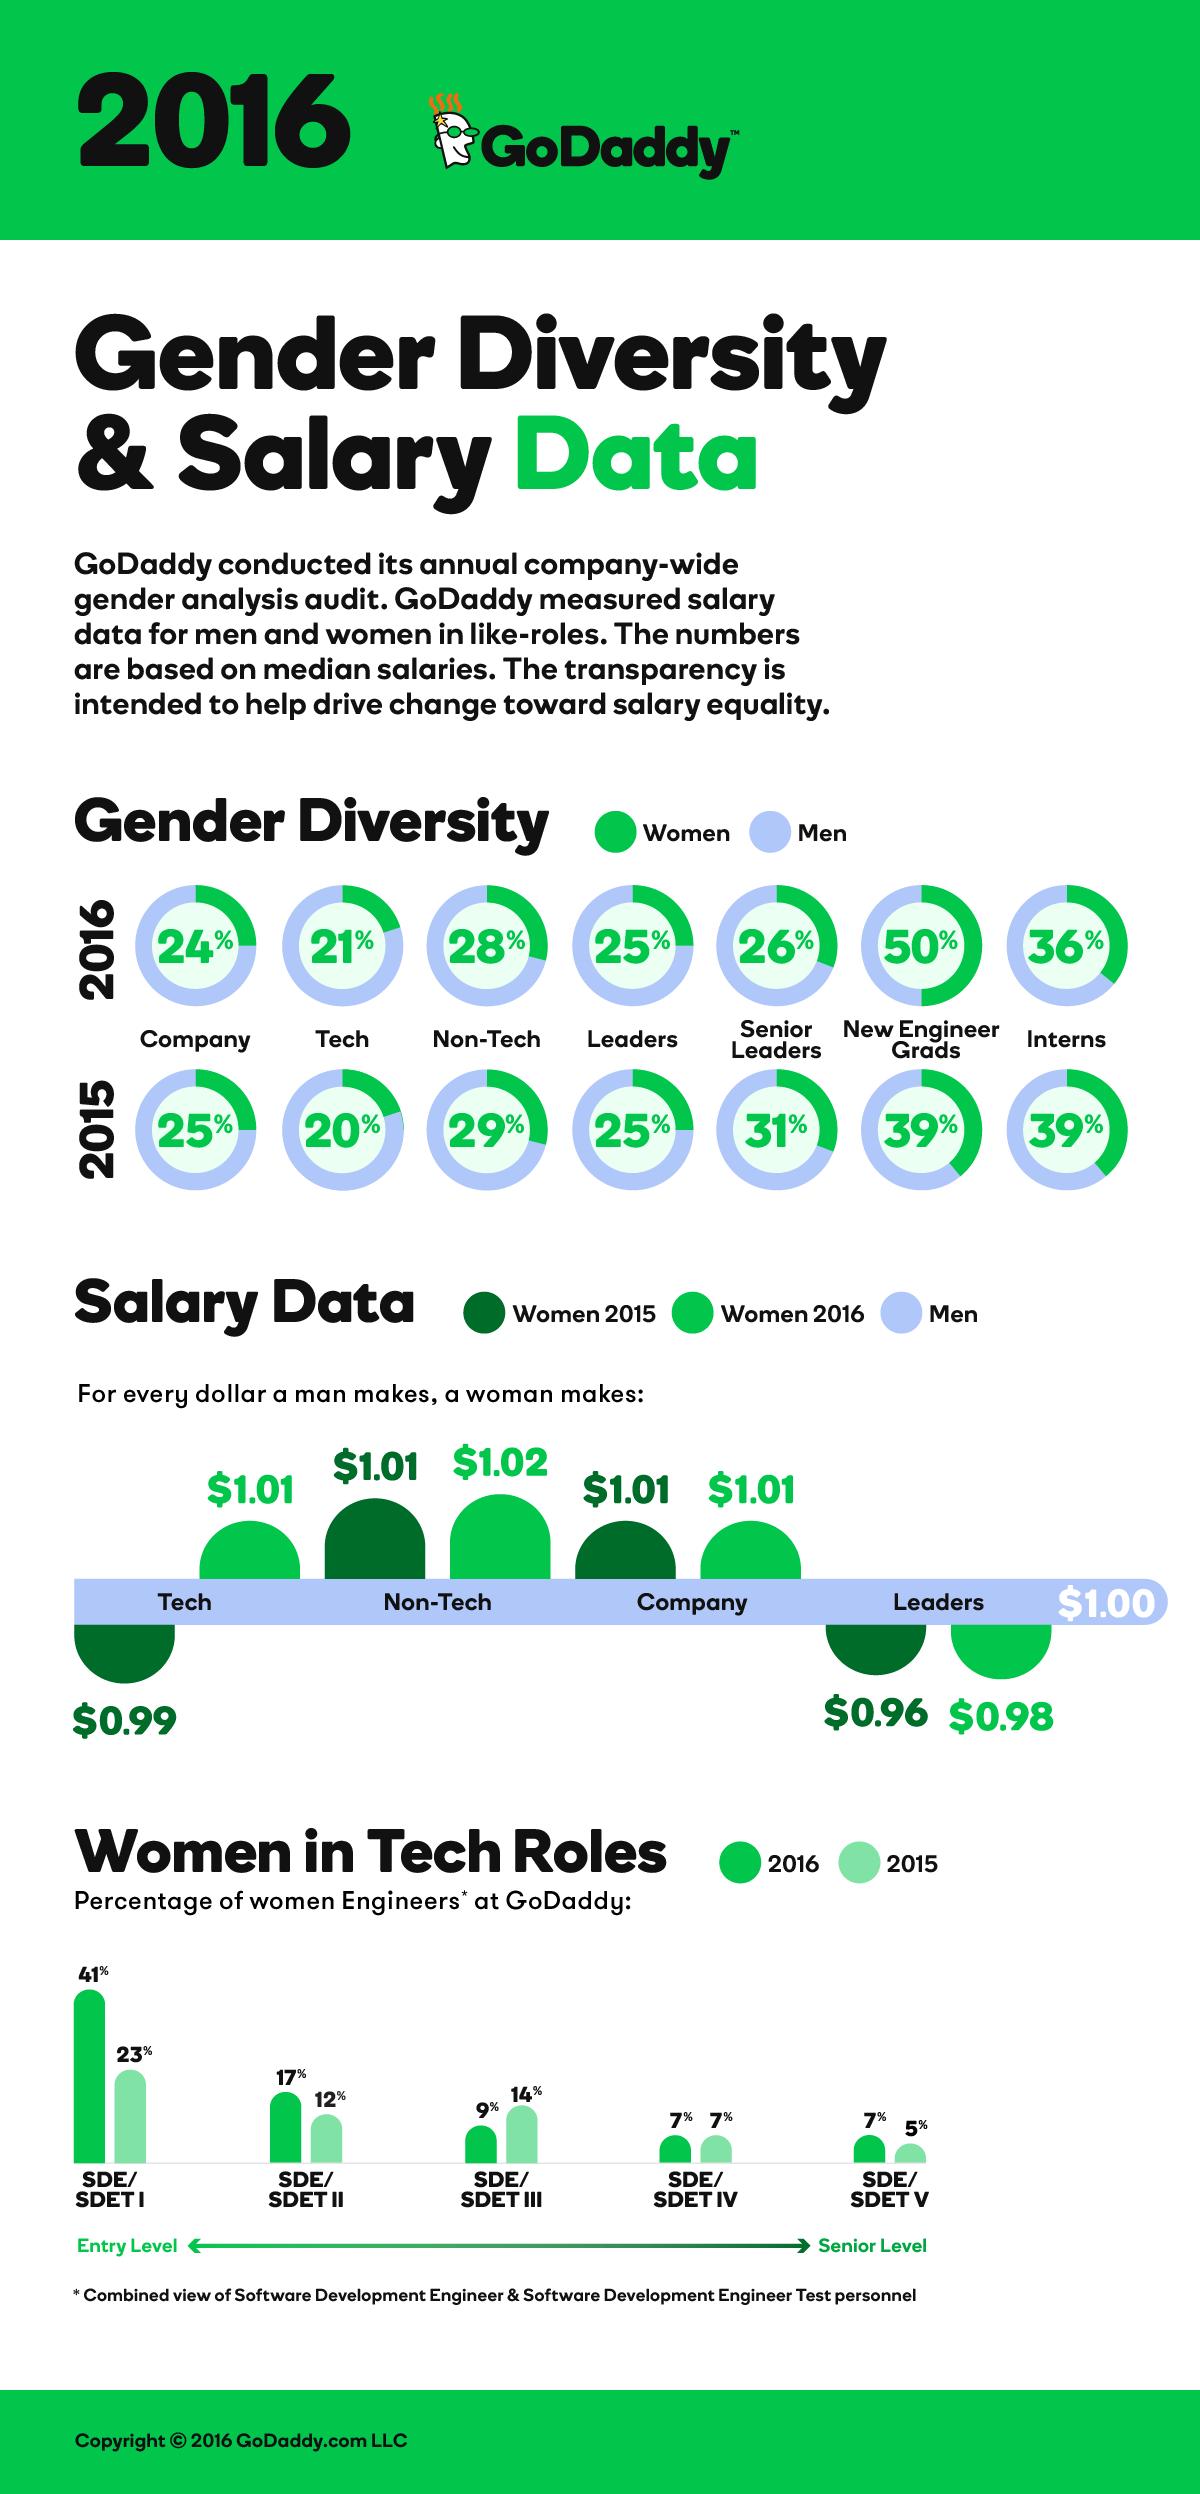 GoDaddy Gender Diversity Salary Data Infographic